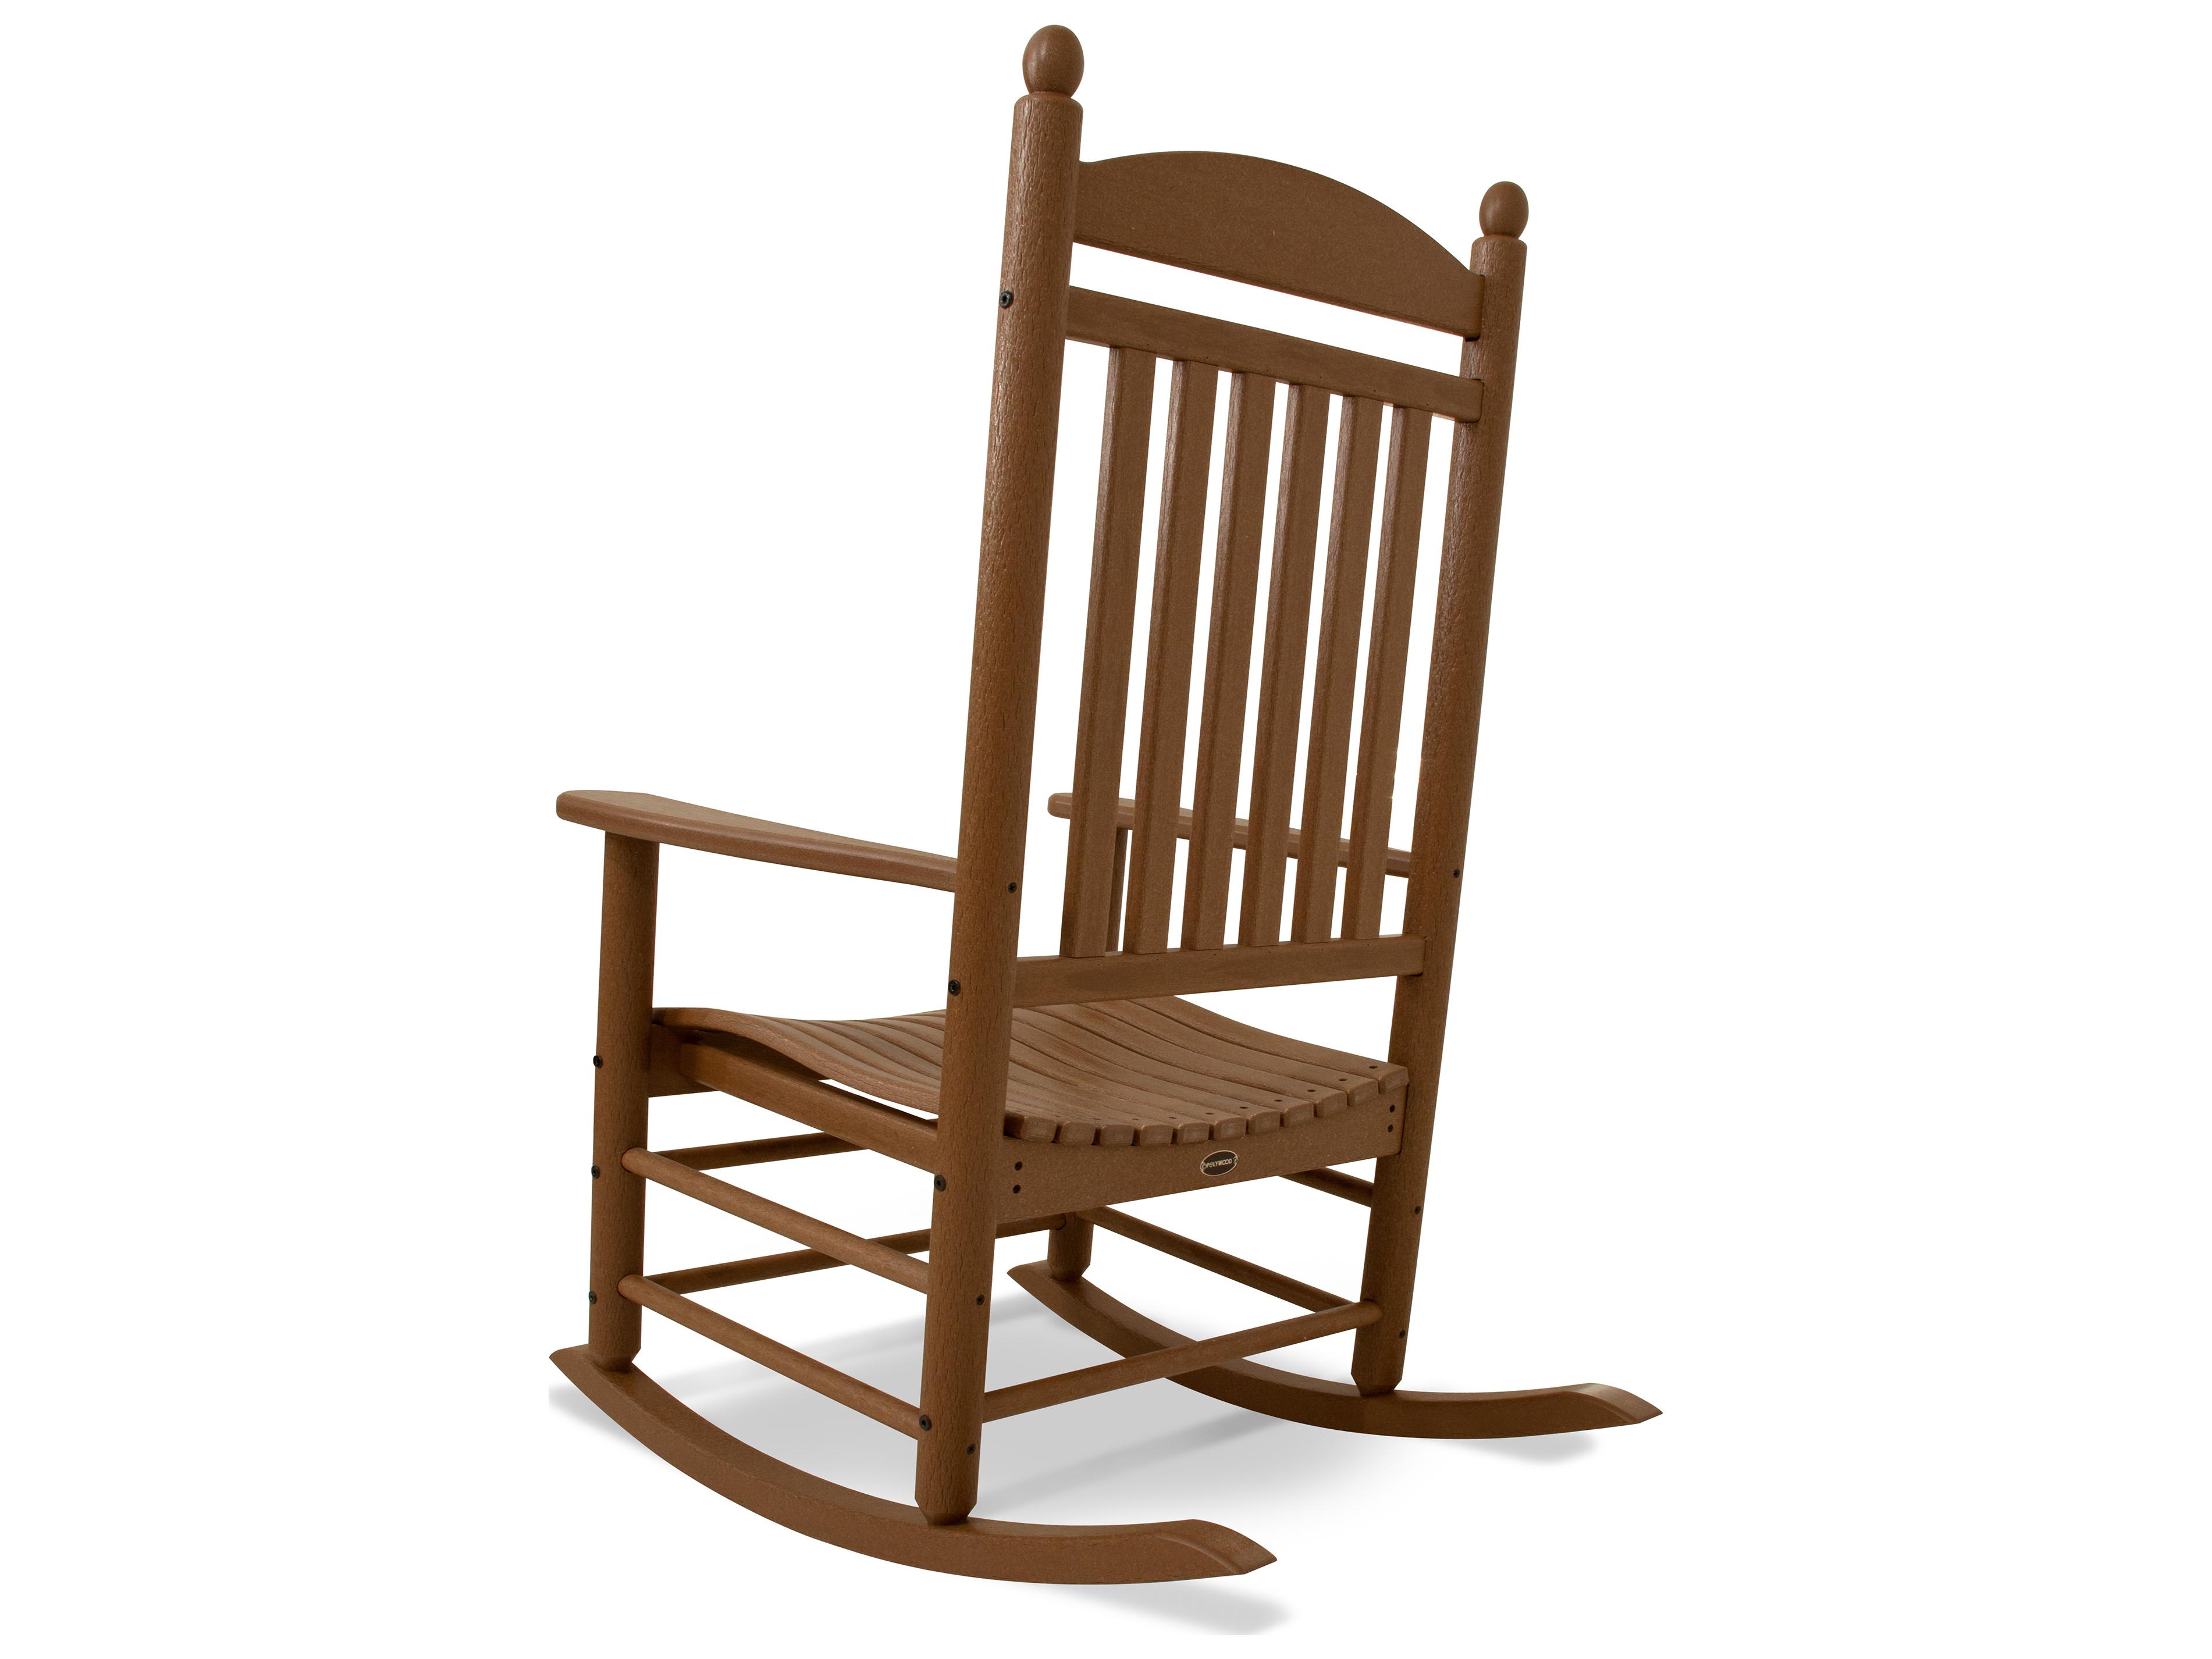 Polywood 174 Rocker Recycled Plastic Arm Lounge Chair Pwj147